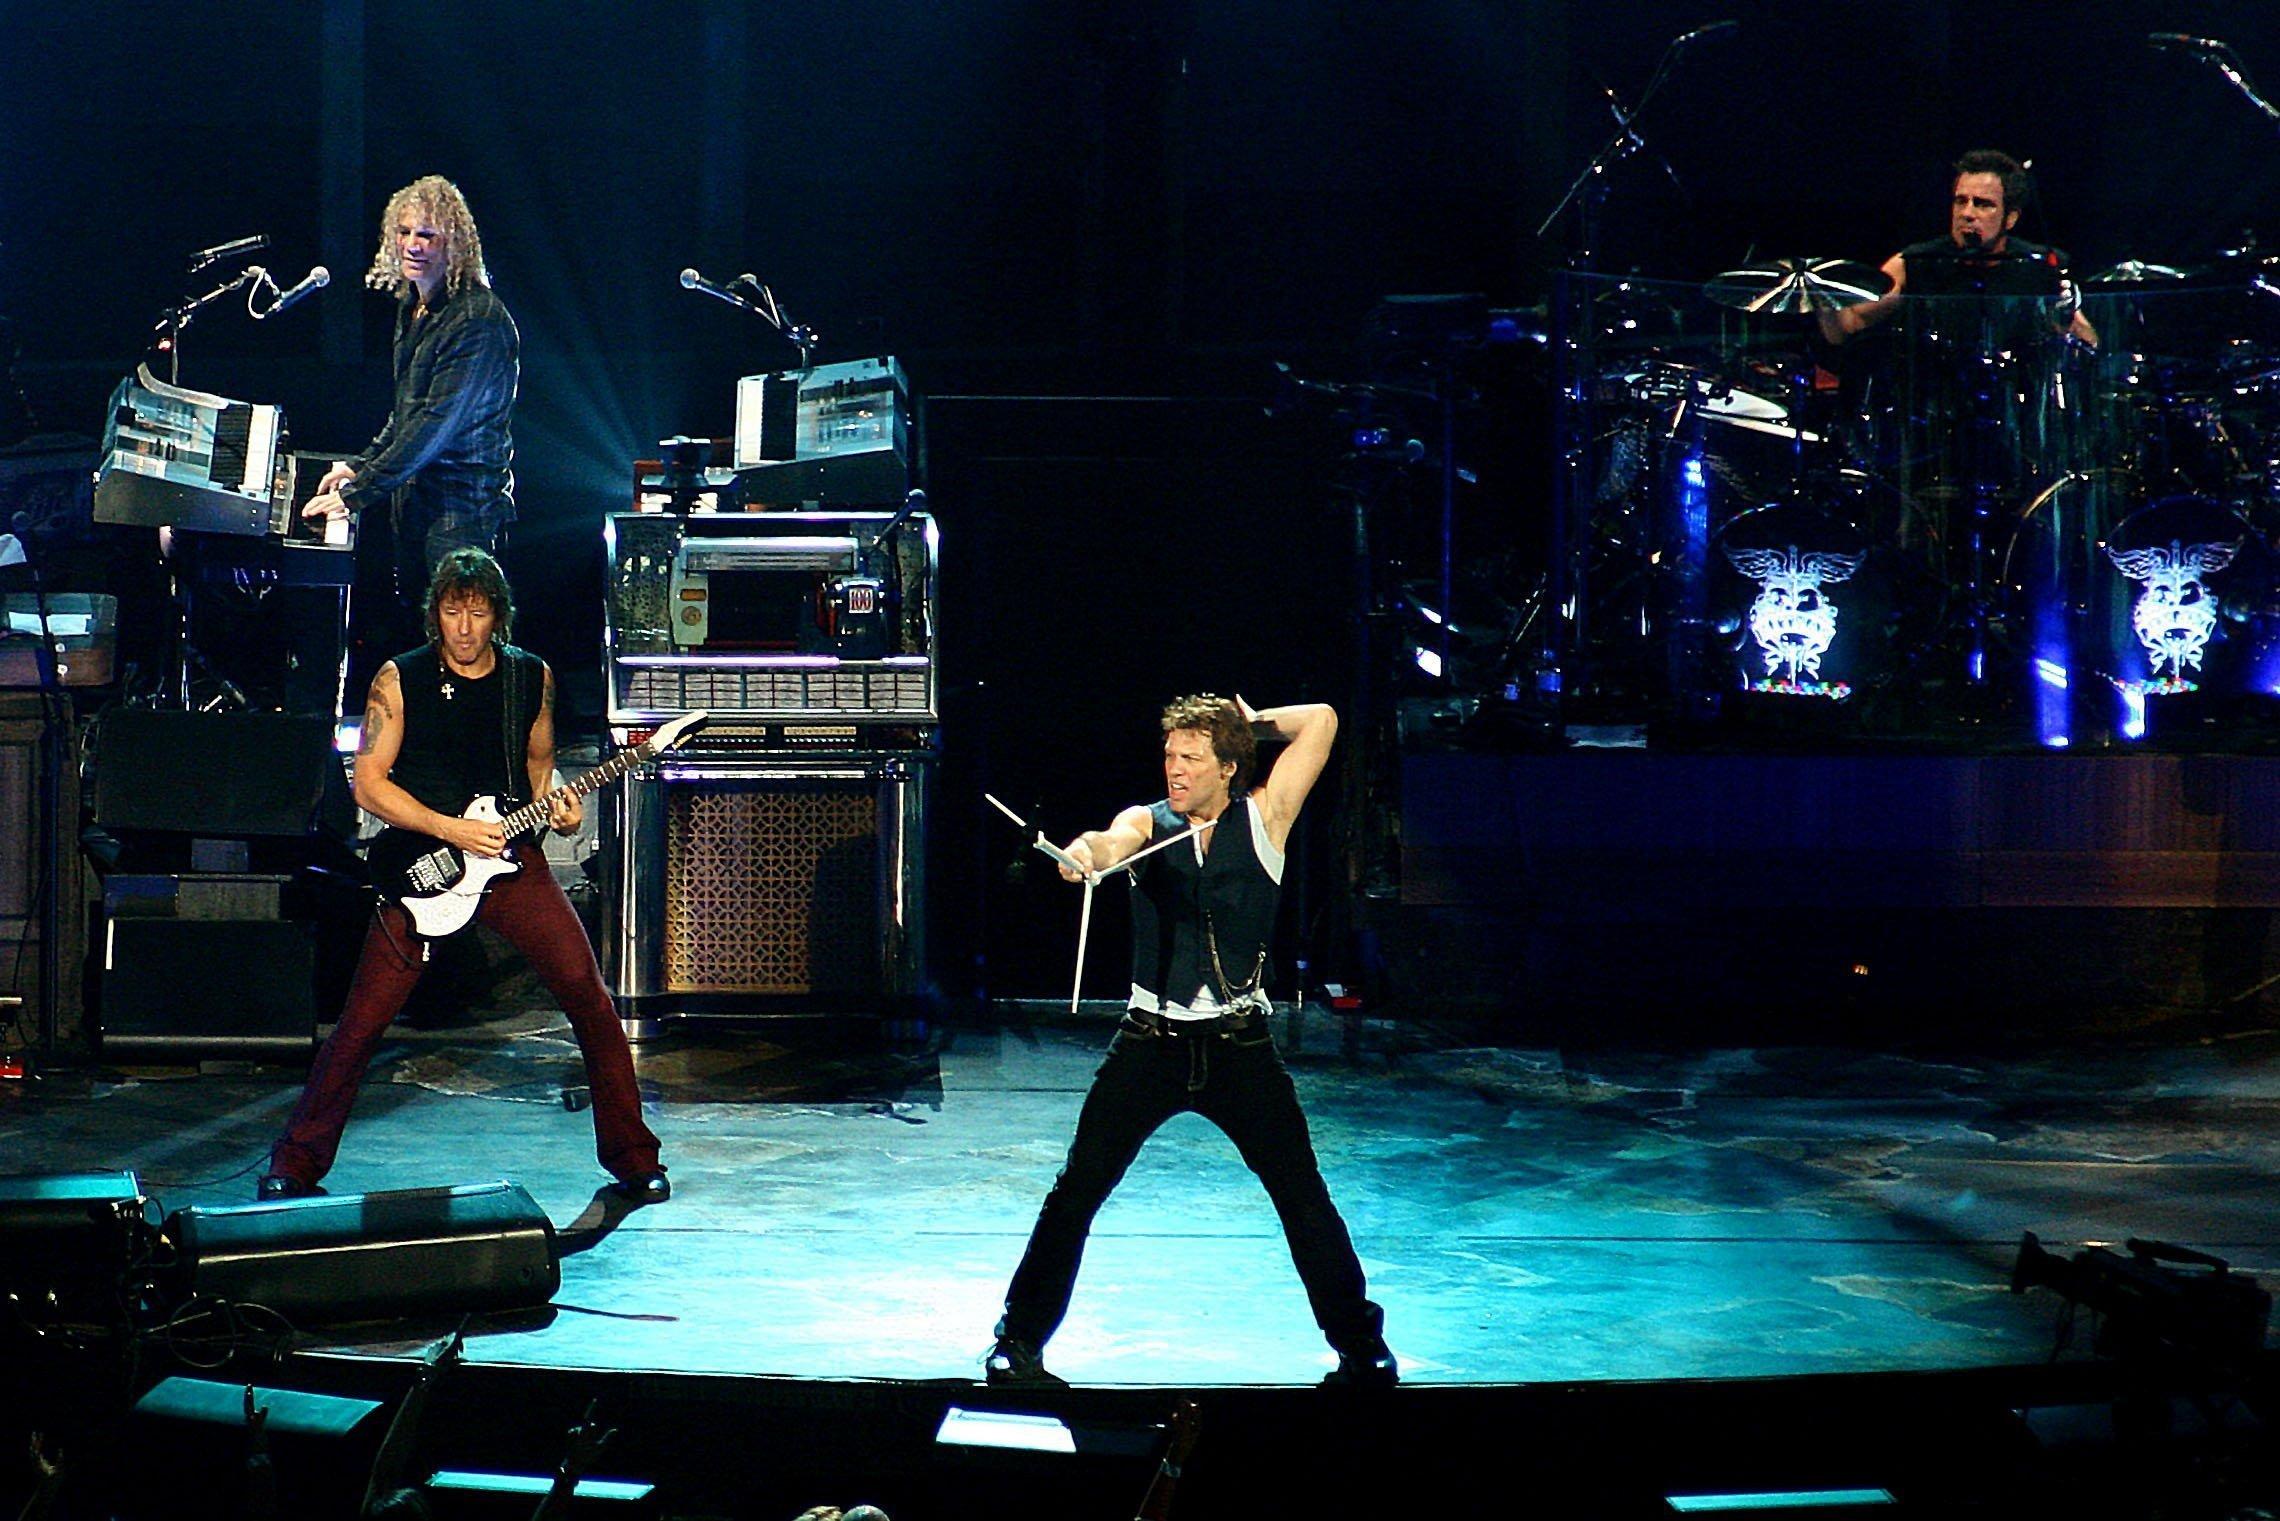 Bon Jovi Official Photo - Jon Bon Jovi, David Bryan, Tico Torres, Richie Sambora